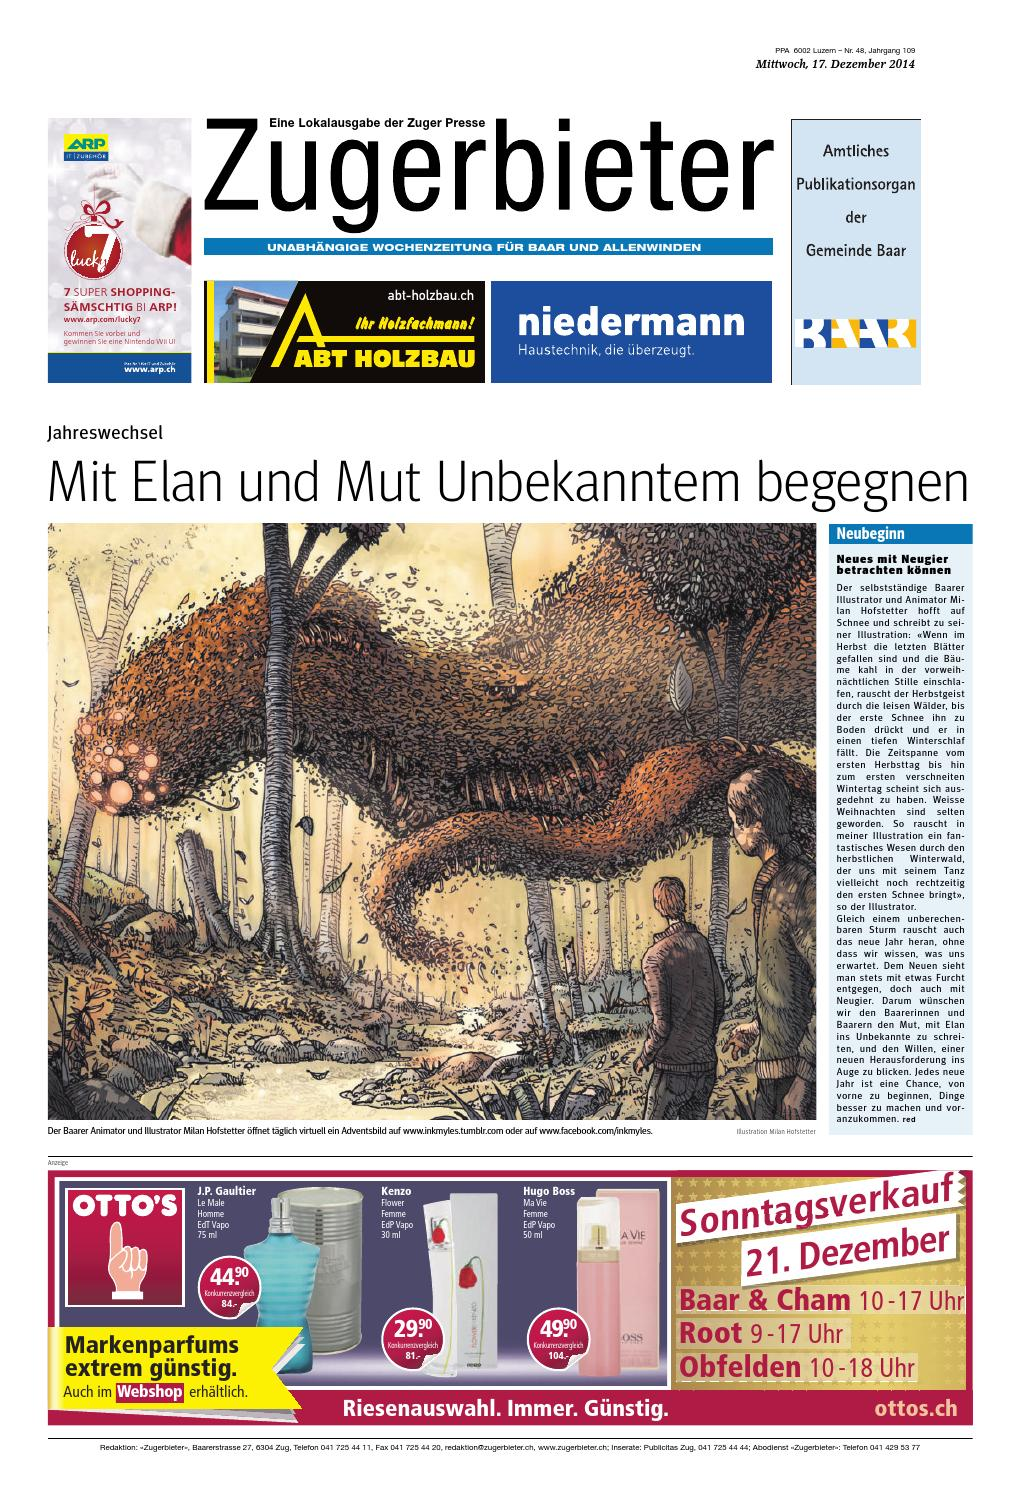 Zugerbieter 20141217 by Zuger Presse - Zugerbieter - issuu